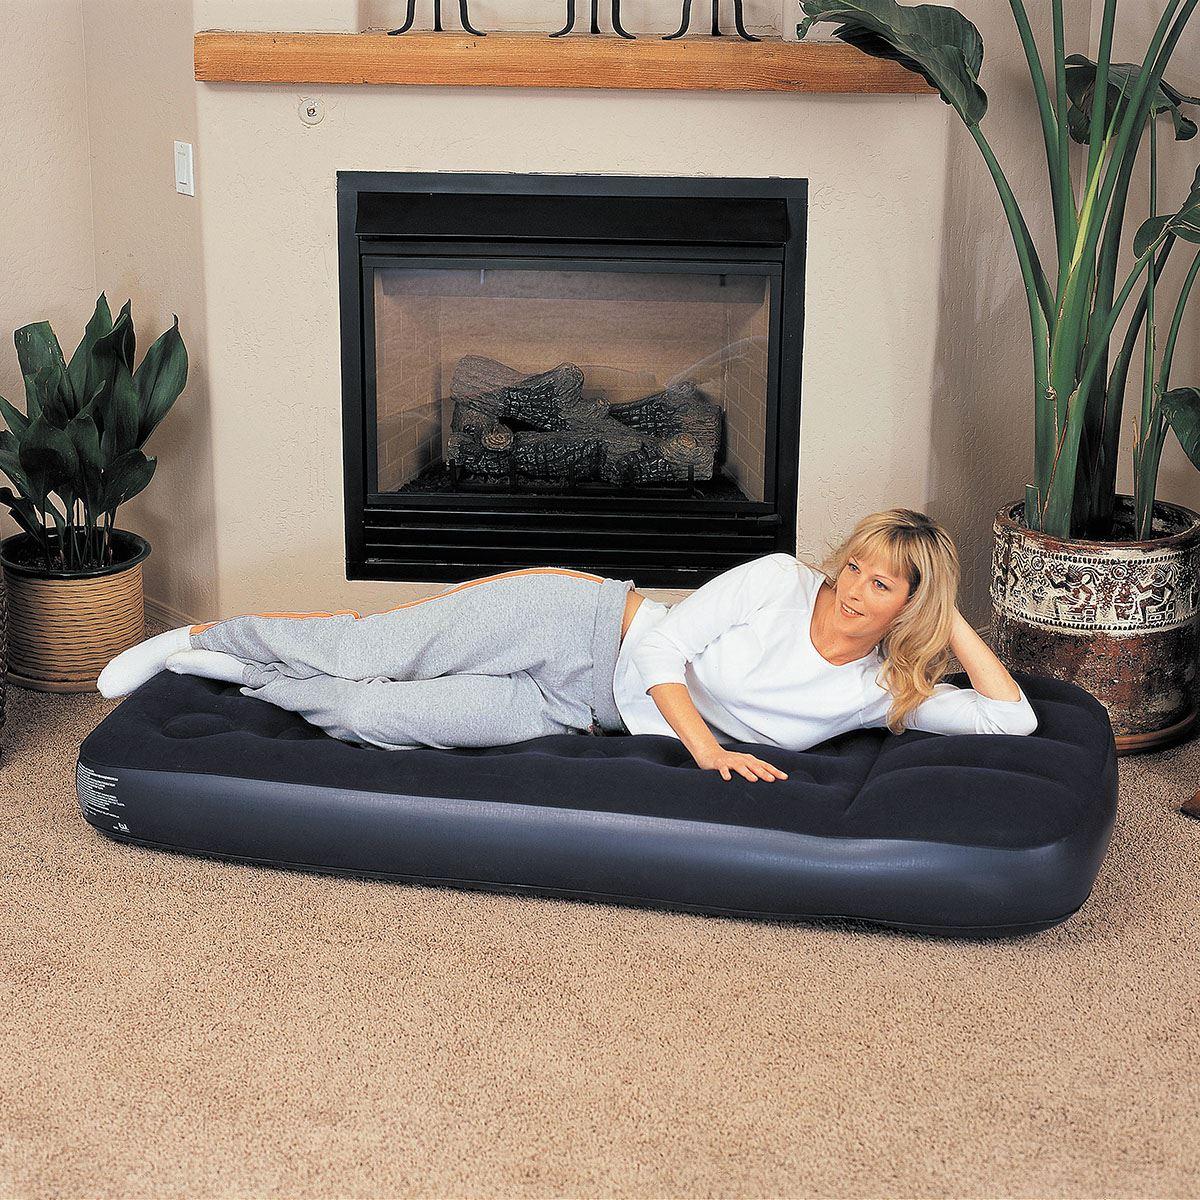 bestway inflatable blow up flocked guest sleeping airbed. Black Bedroom Furniture Sets. Home Design Ideas